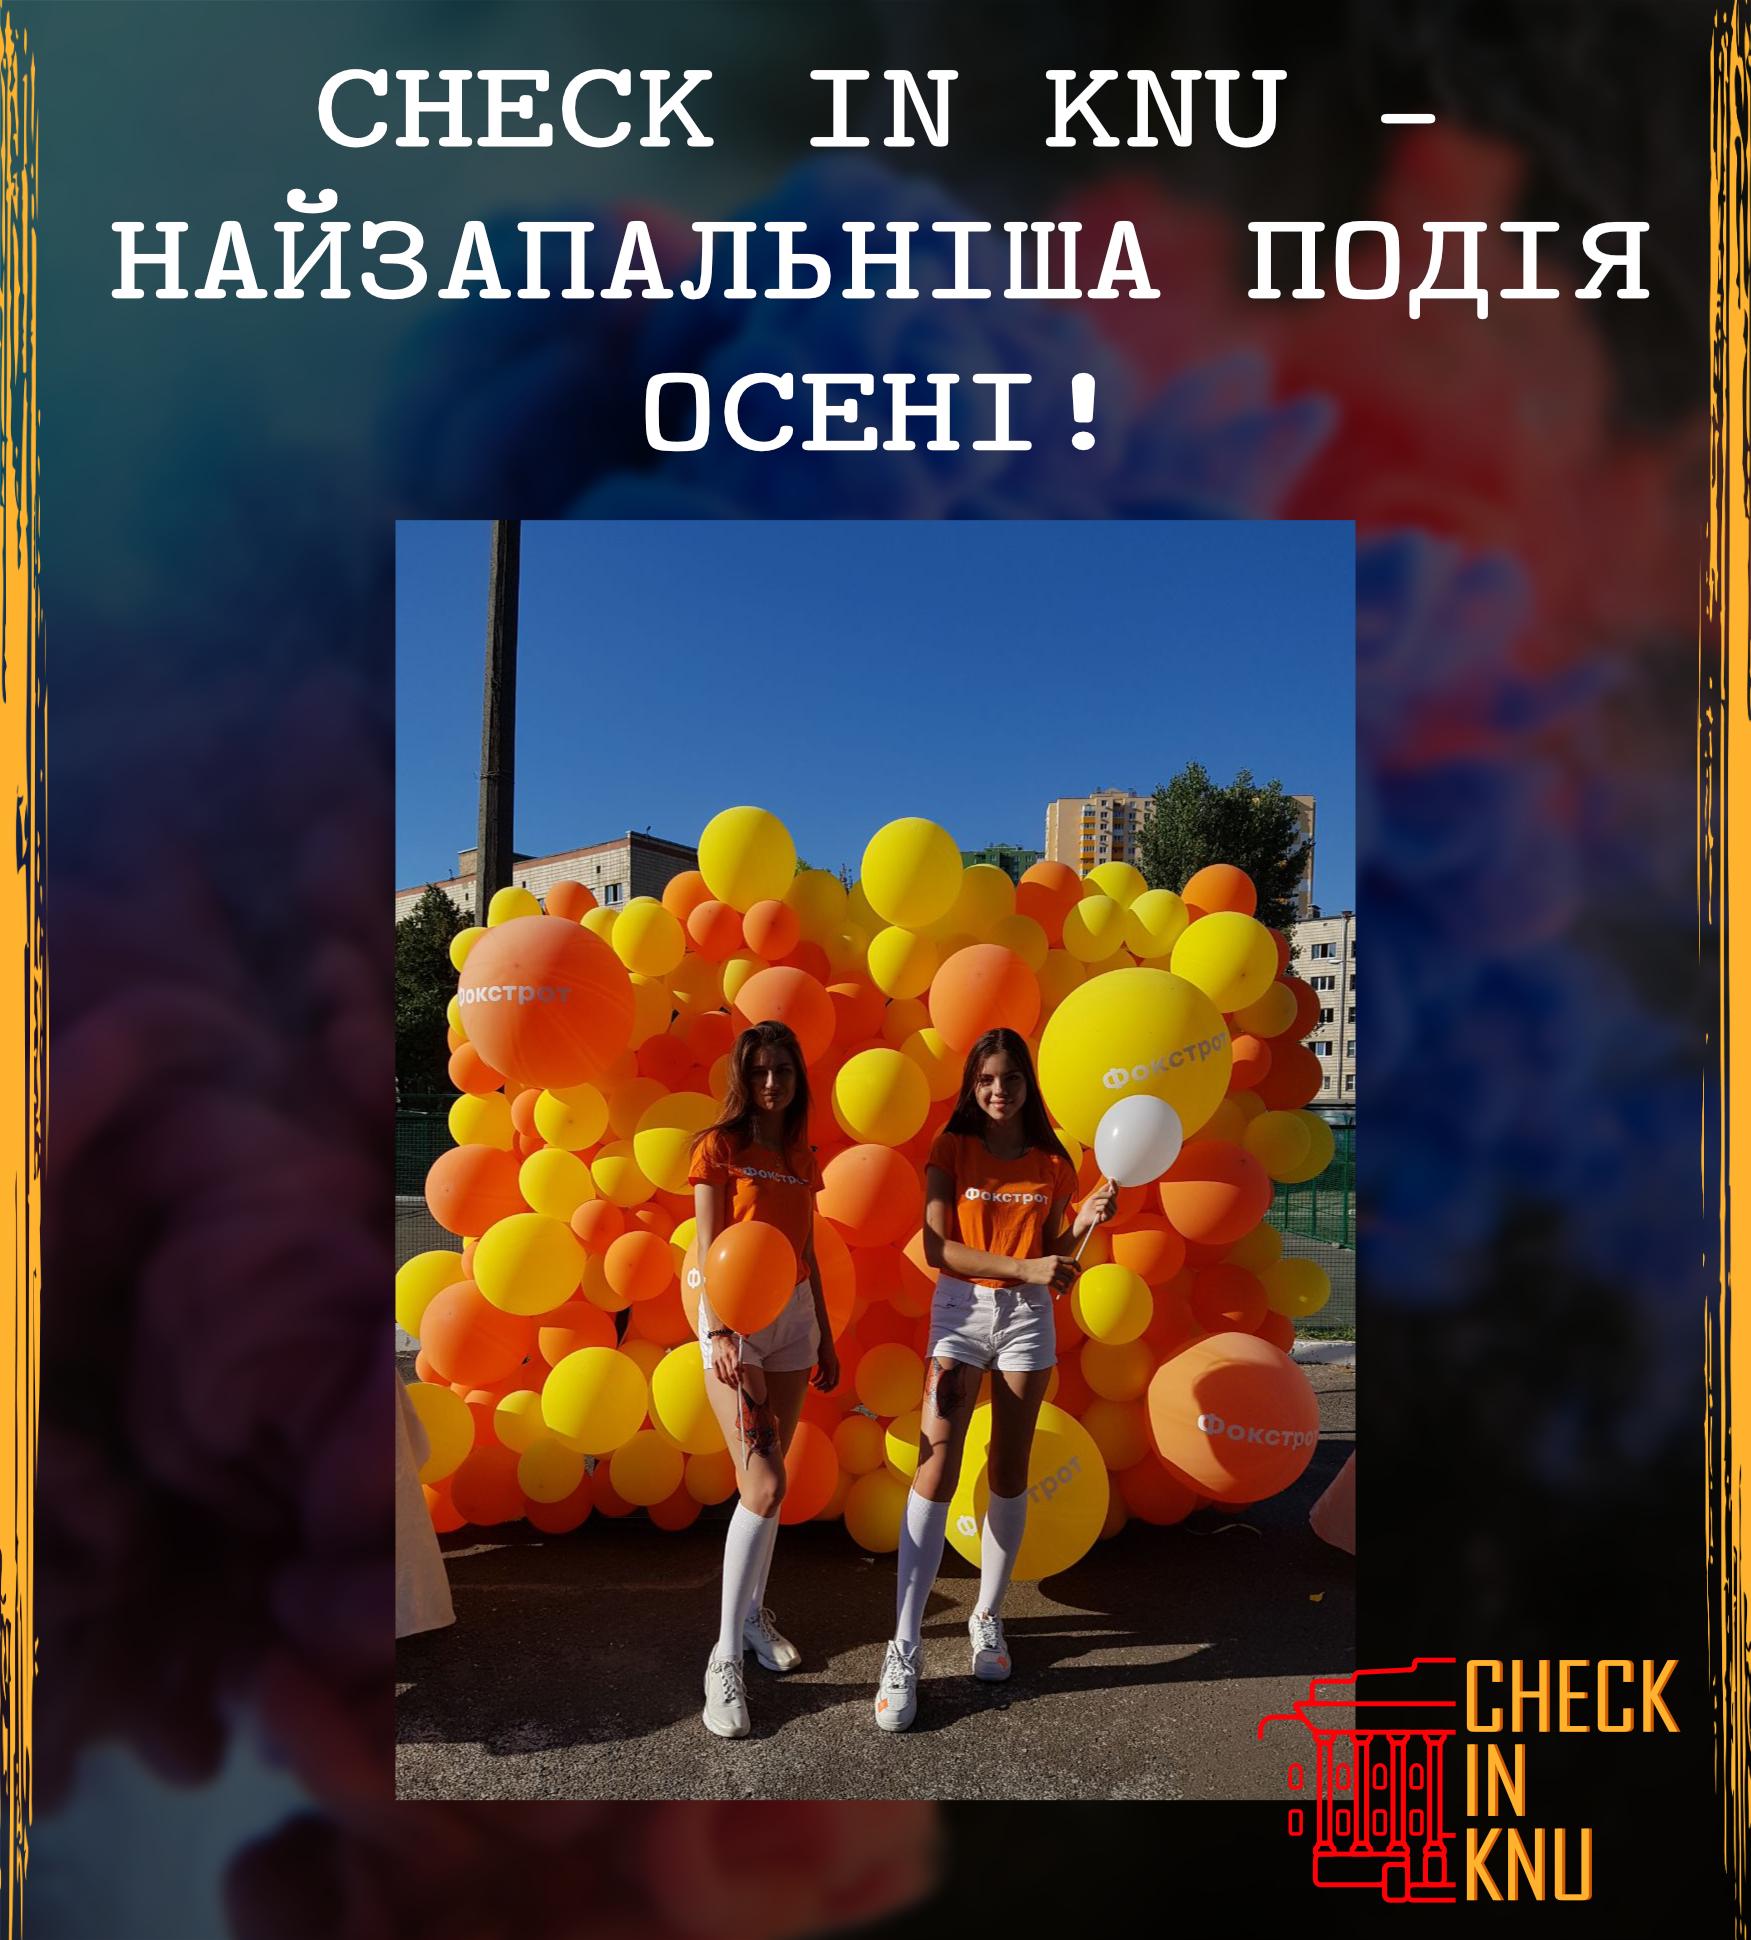 Check in KNU – найзапальніша подія осені!